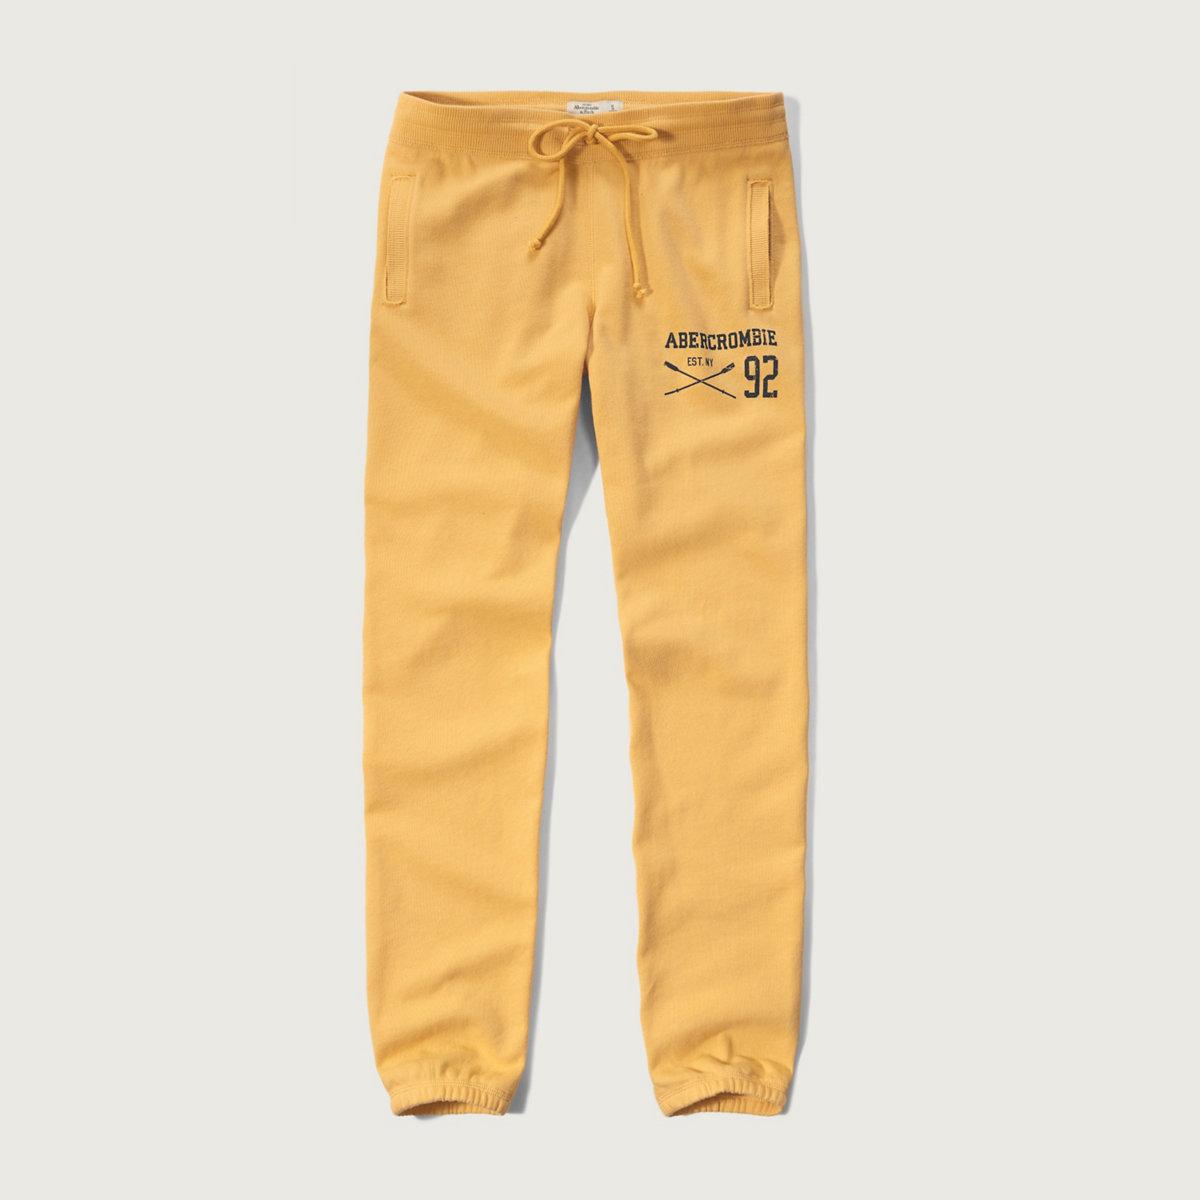 A&F Banded Fleece Sweatpants